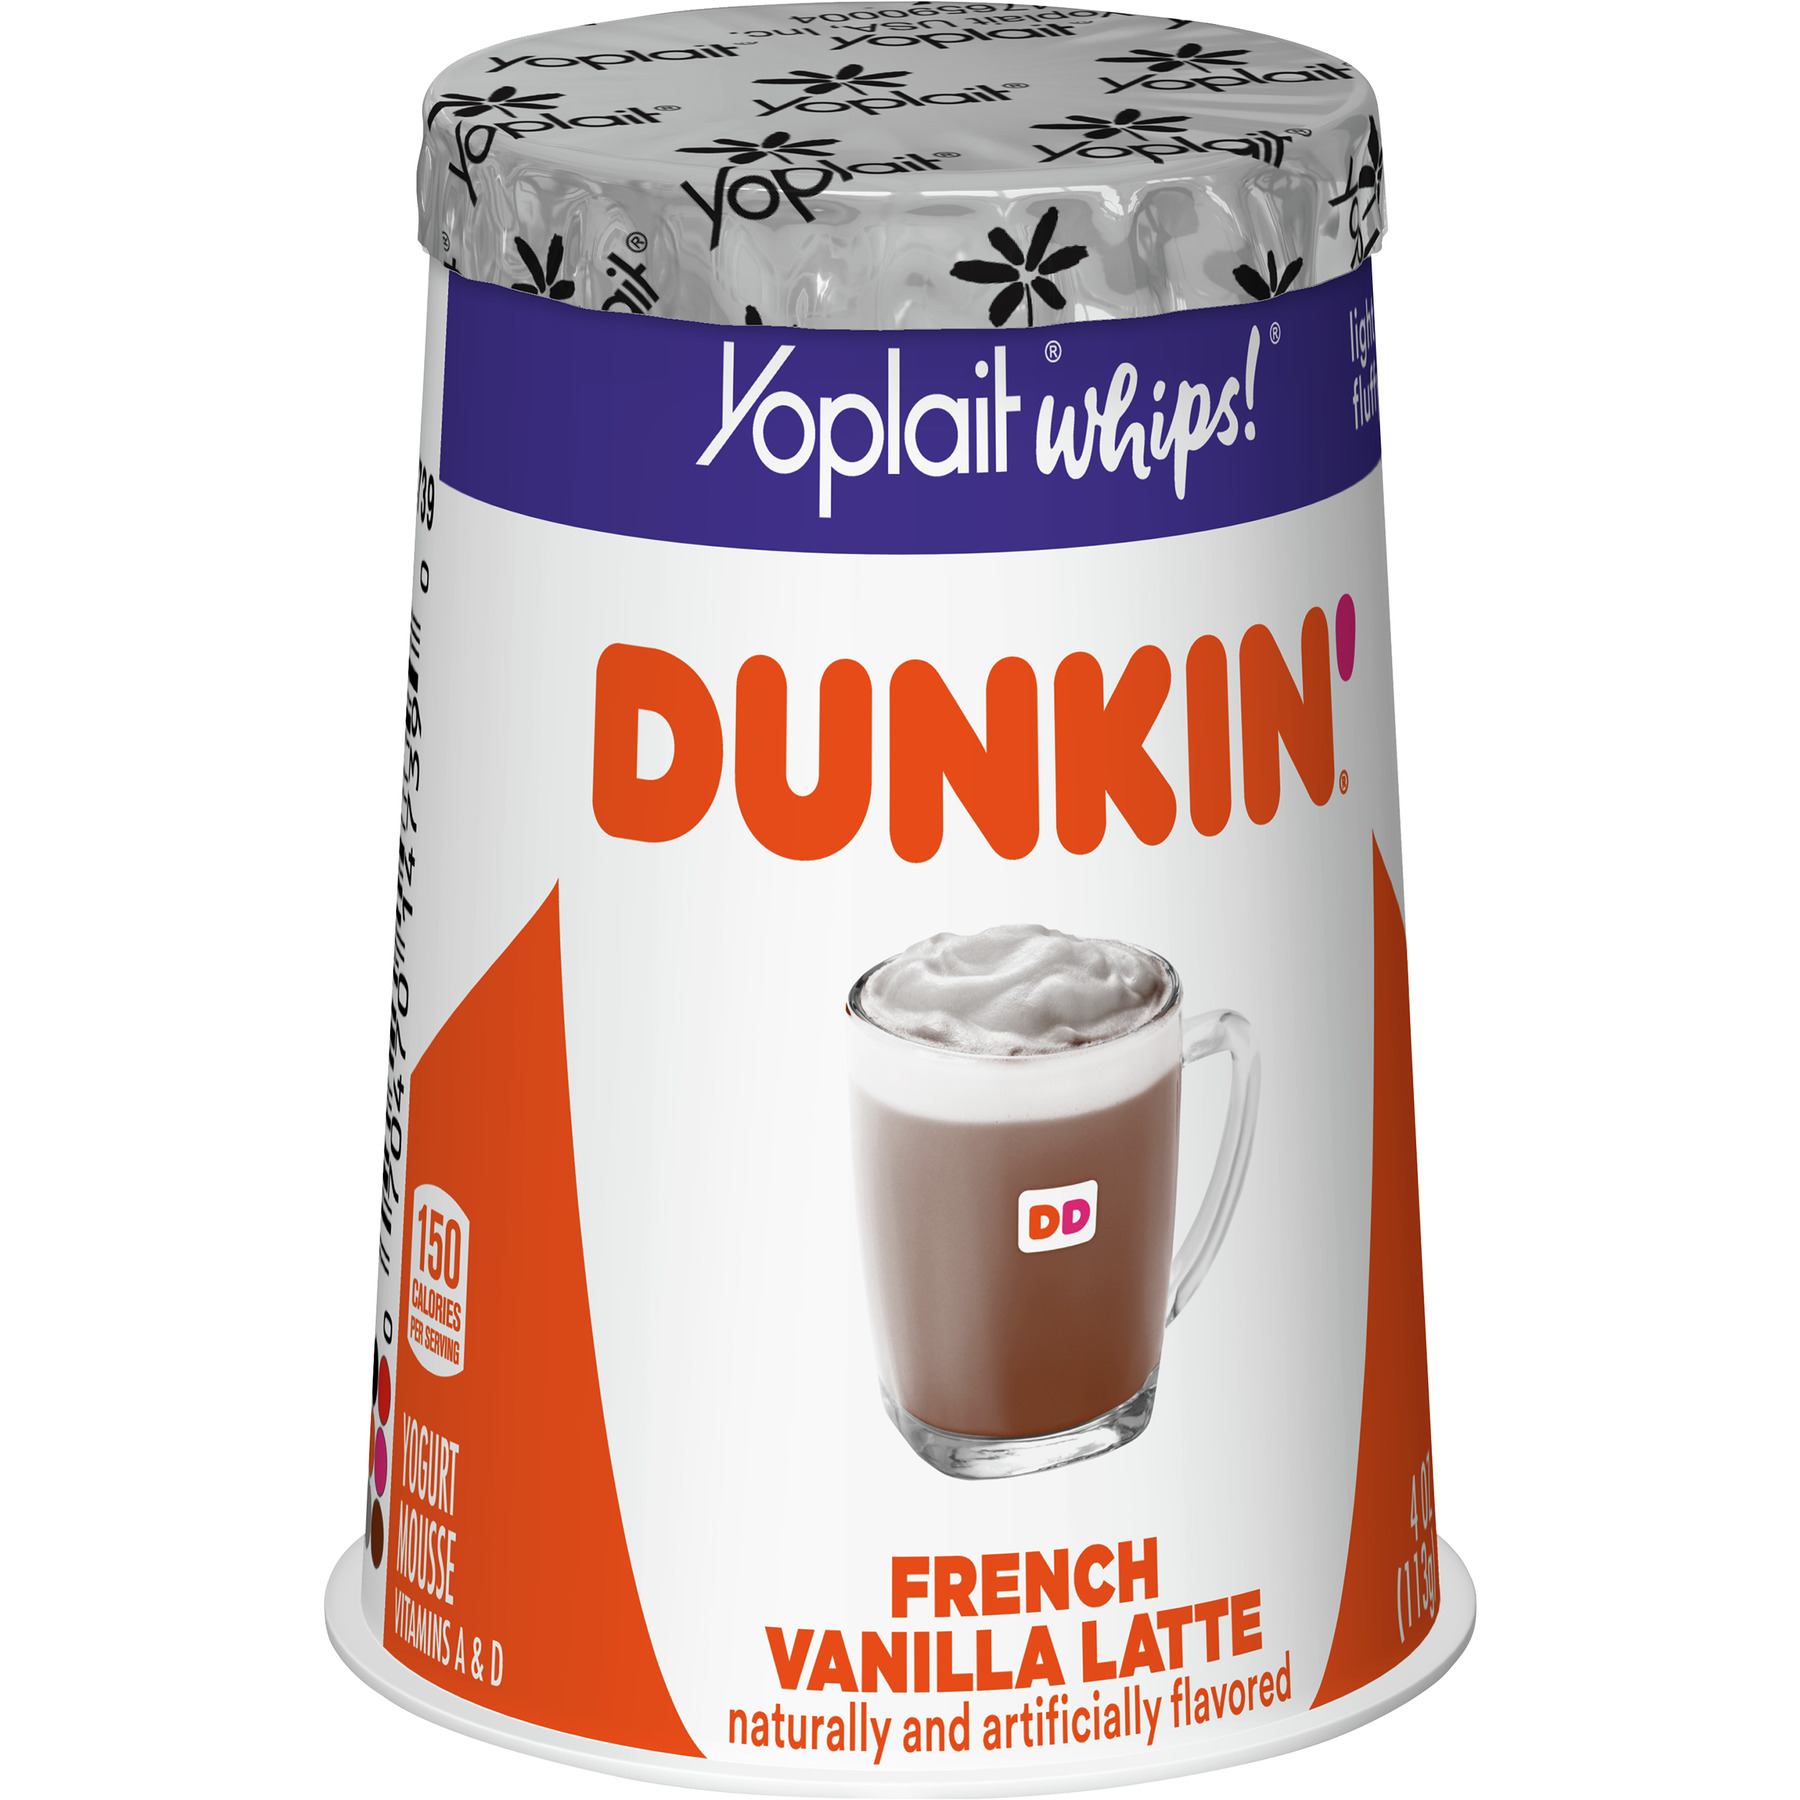 Dunkin' French Vanilla Latte Yogurt